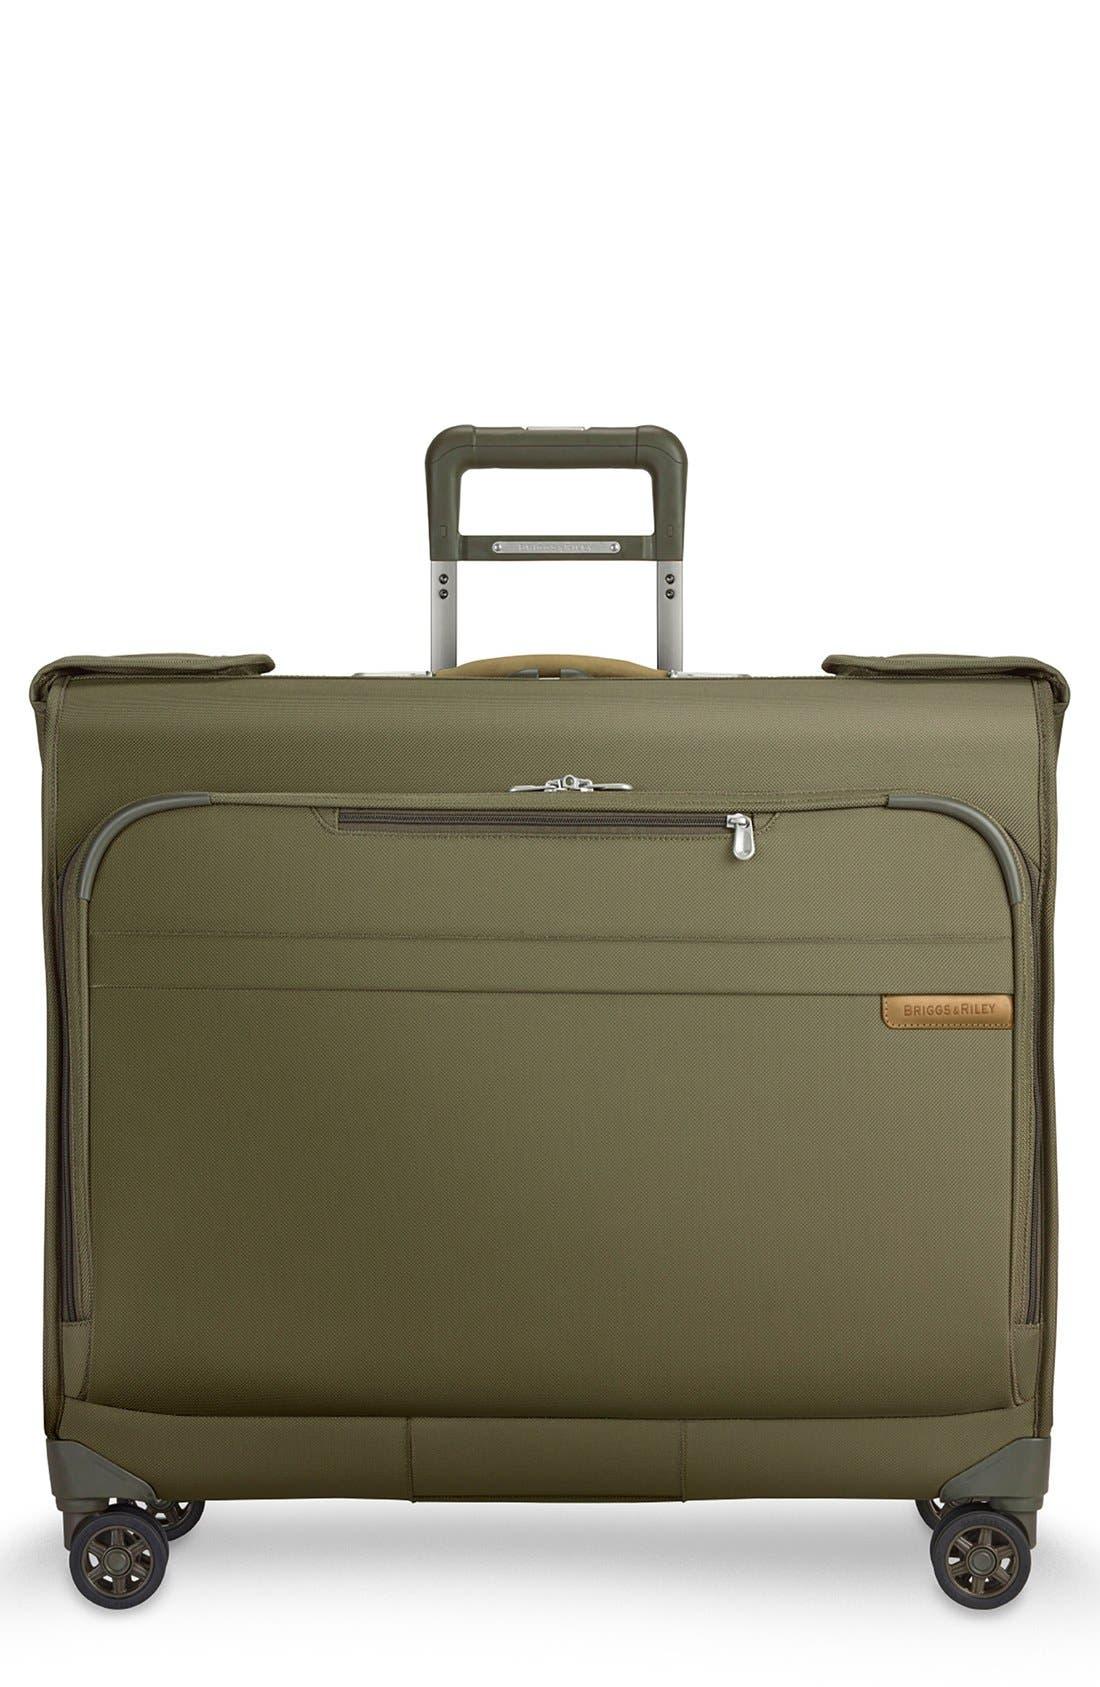 Alternate Image 1 Selected - Briggs & Riley 'Baseline' Wheeled Garment Bag (24 Inch)